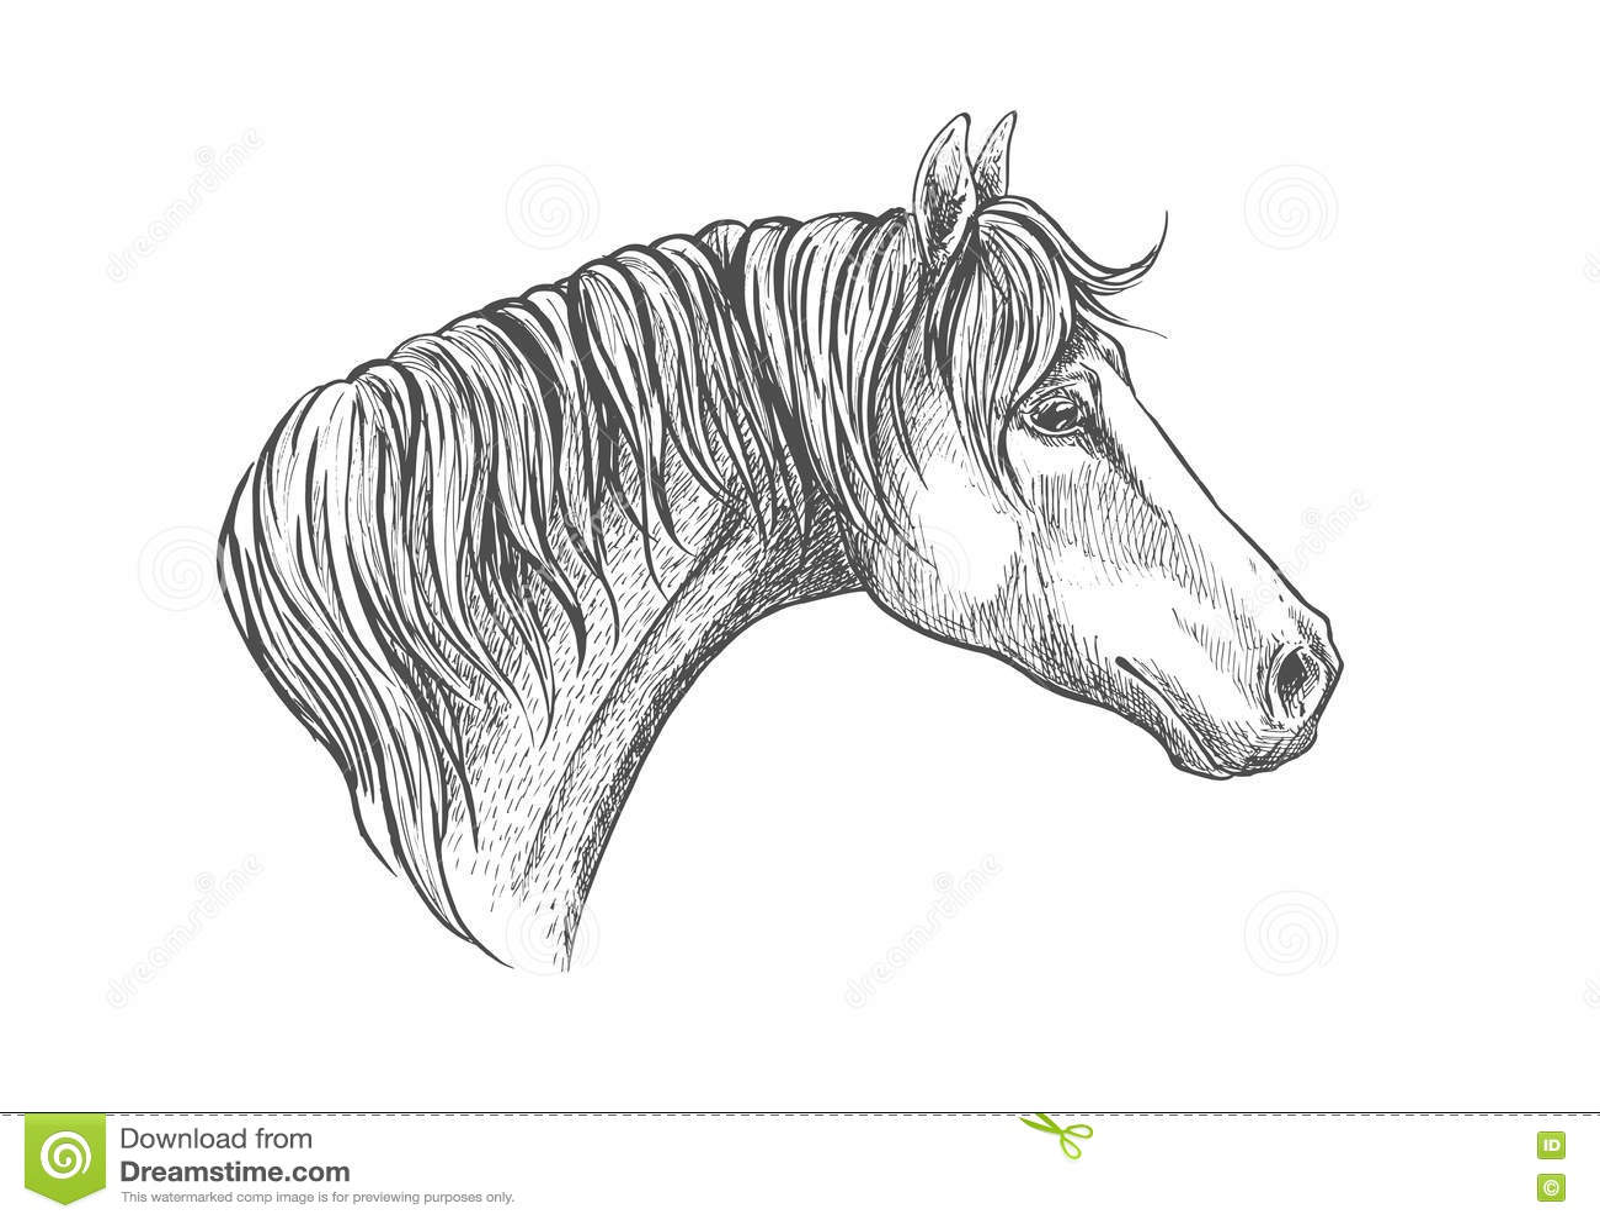 Speedy Racehorse Of American Quarter Breed Sketch Stock